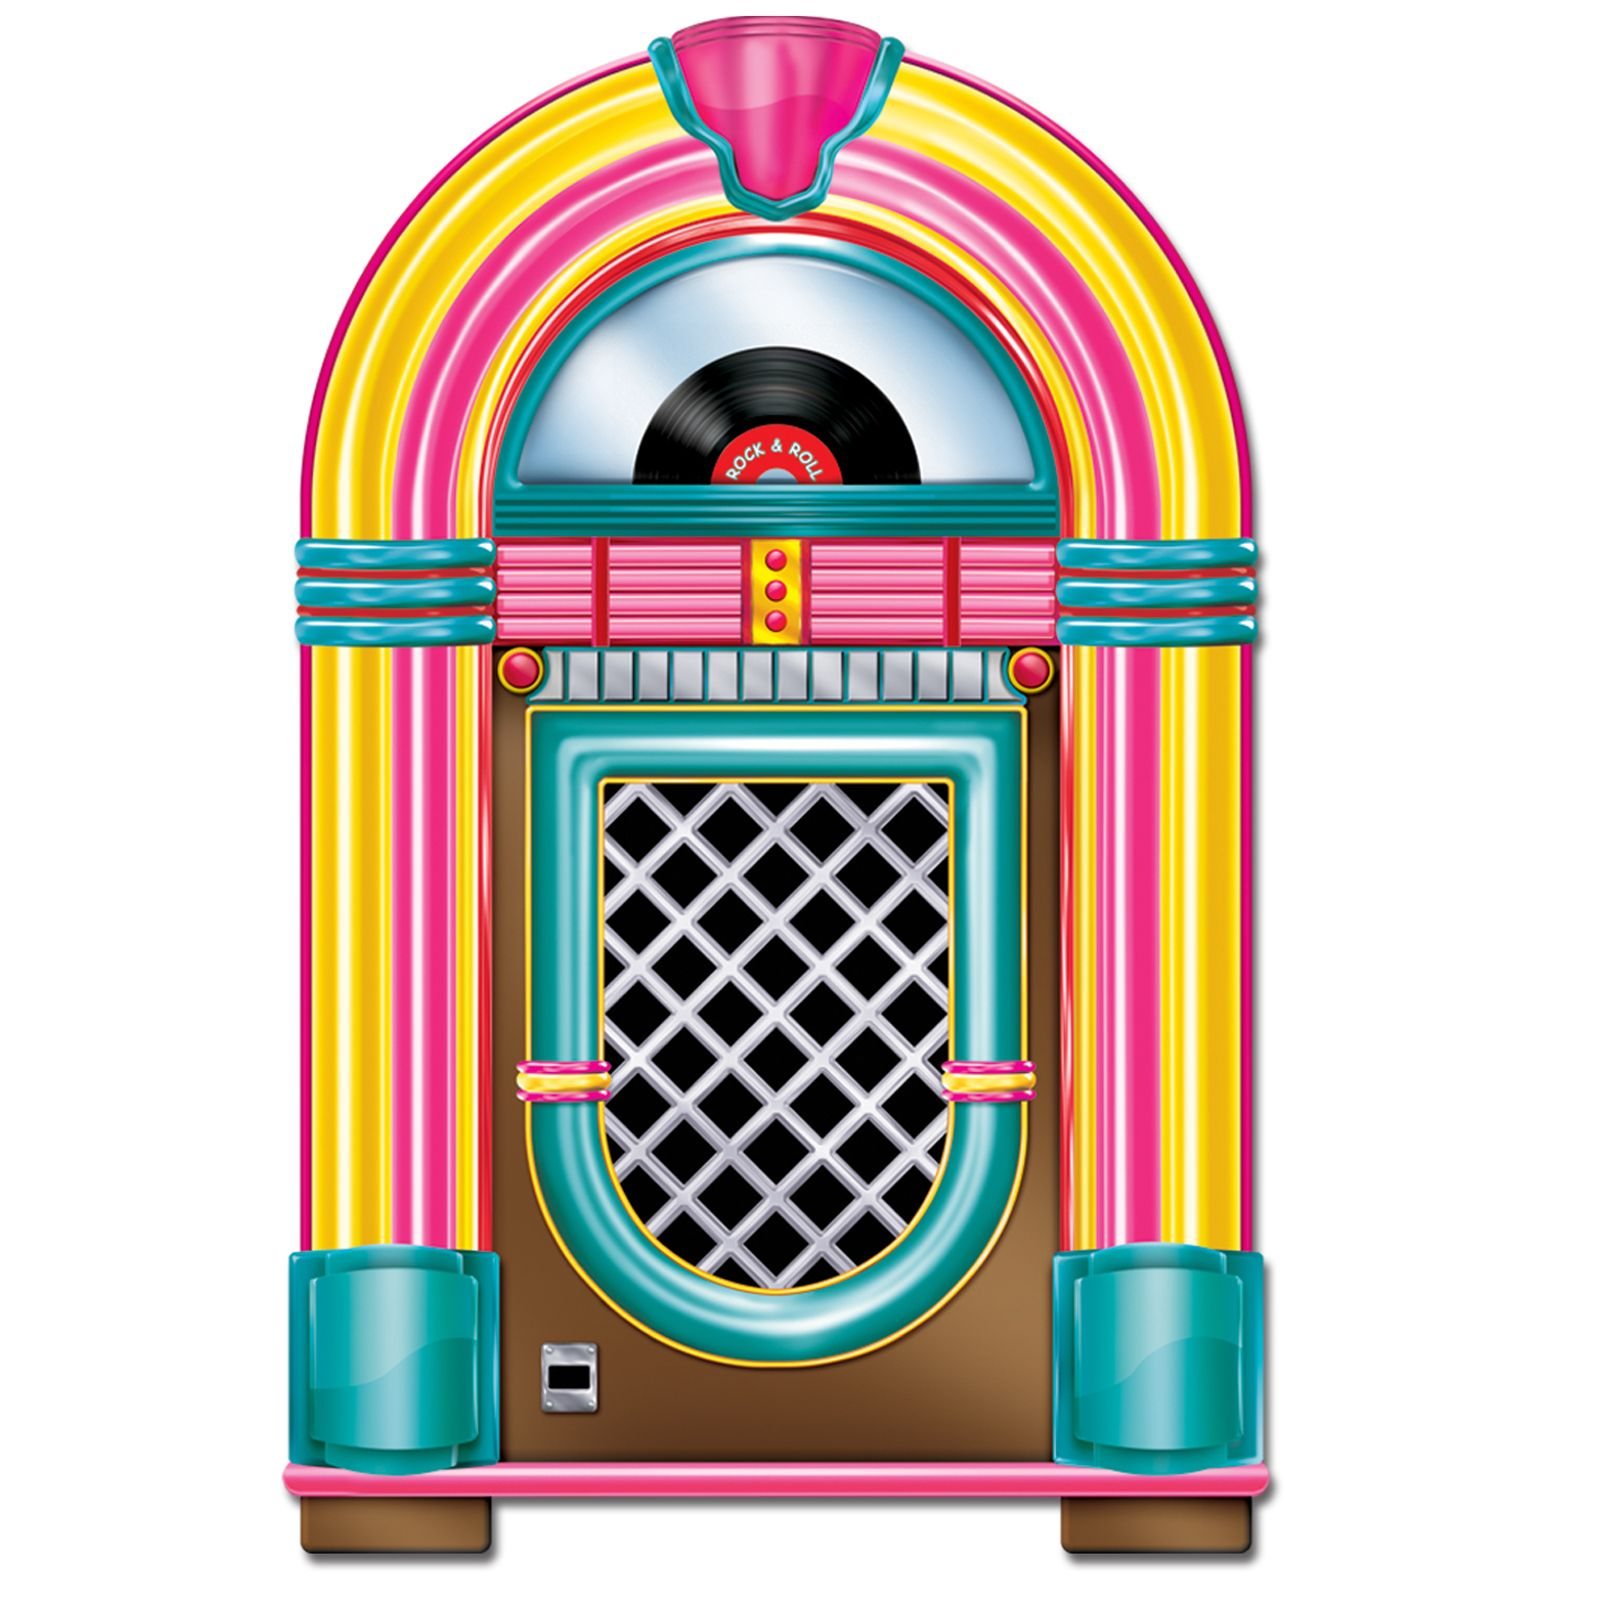 Jukebox clipart nostalgia.  s clip art